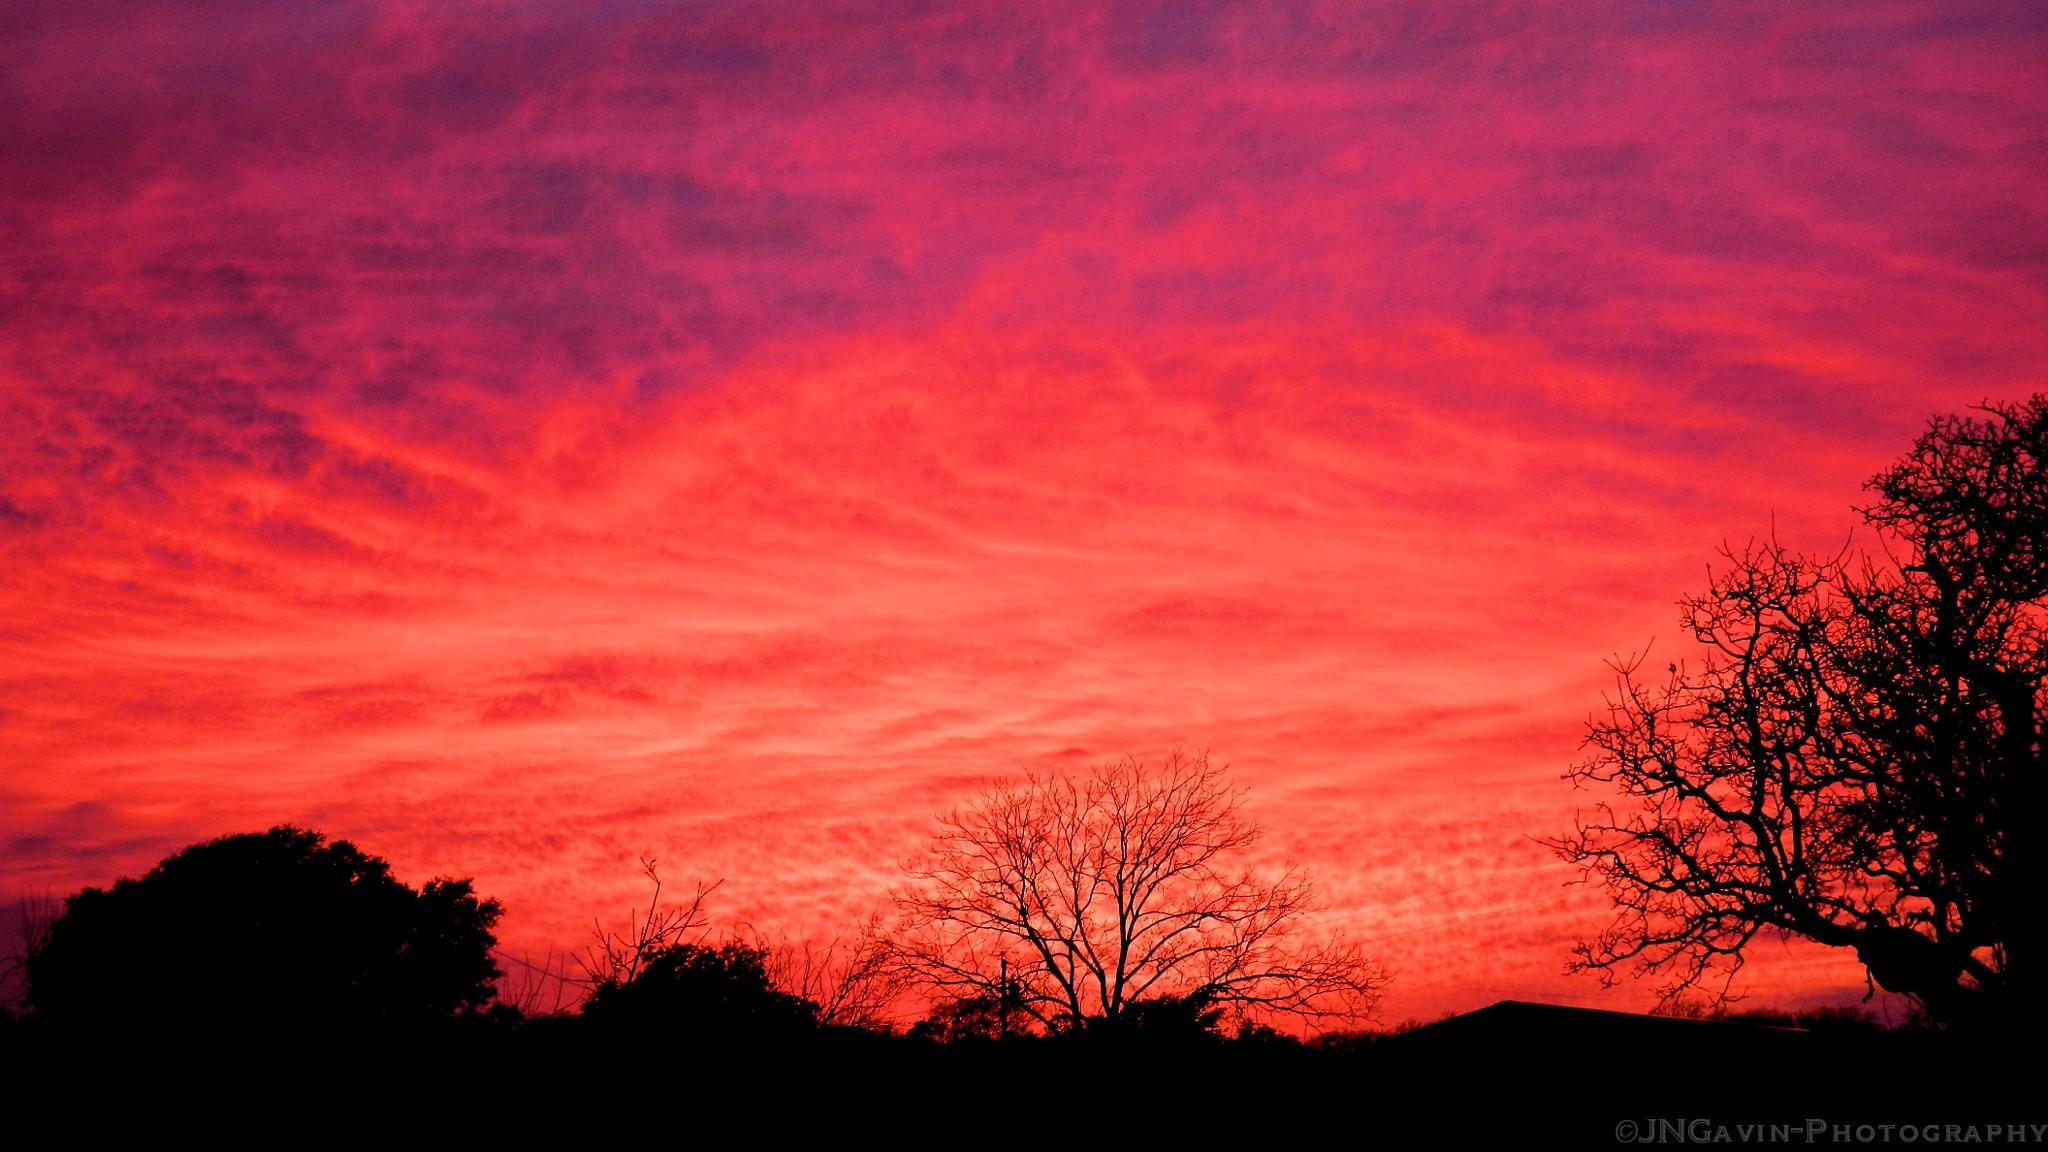 Pretty Sunset last night by John Gavin